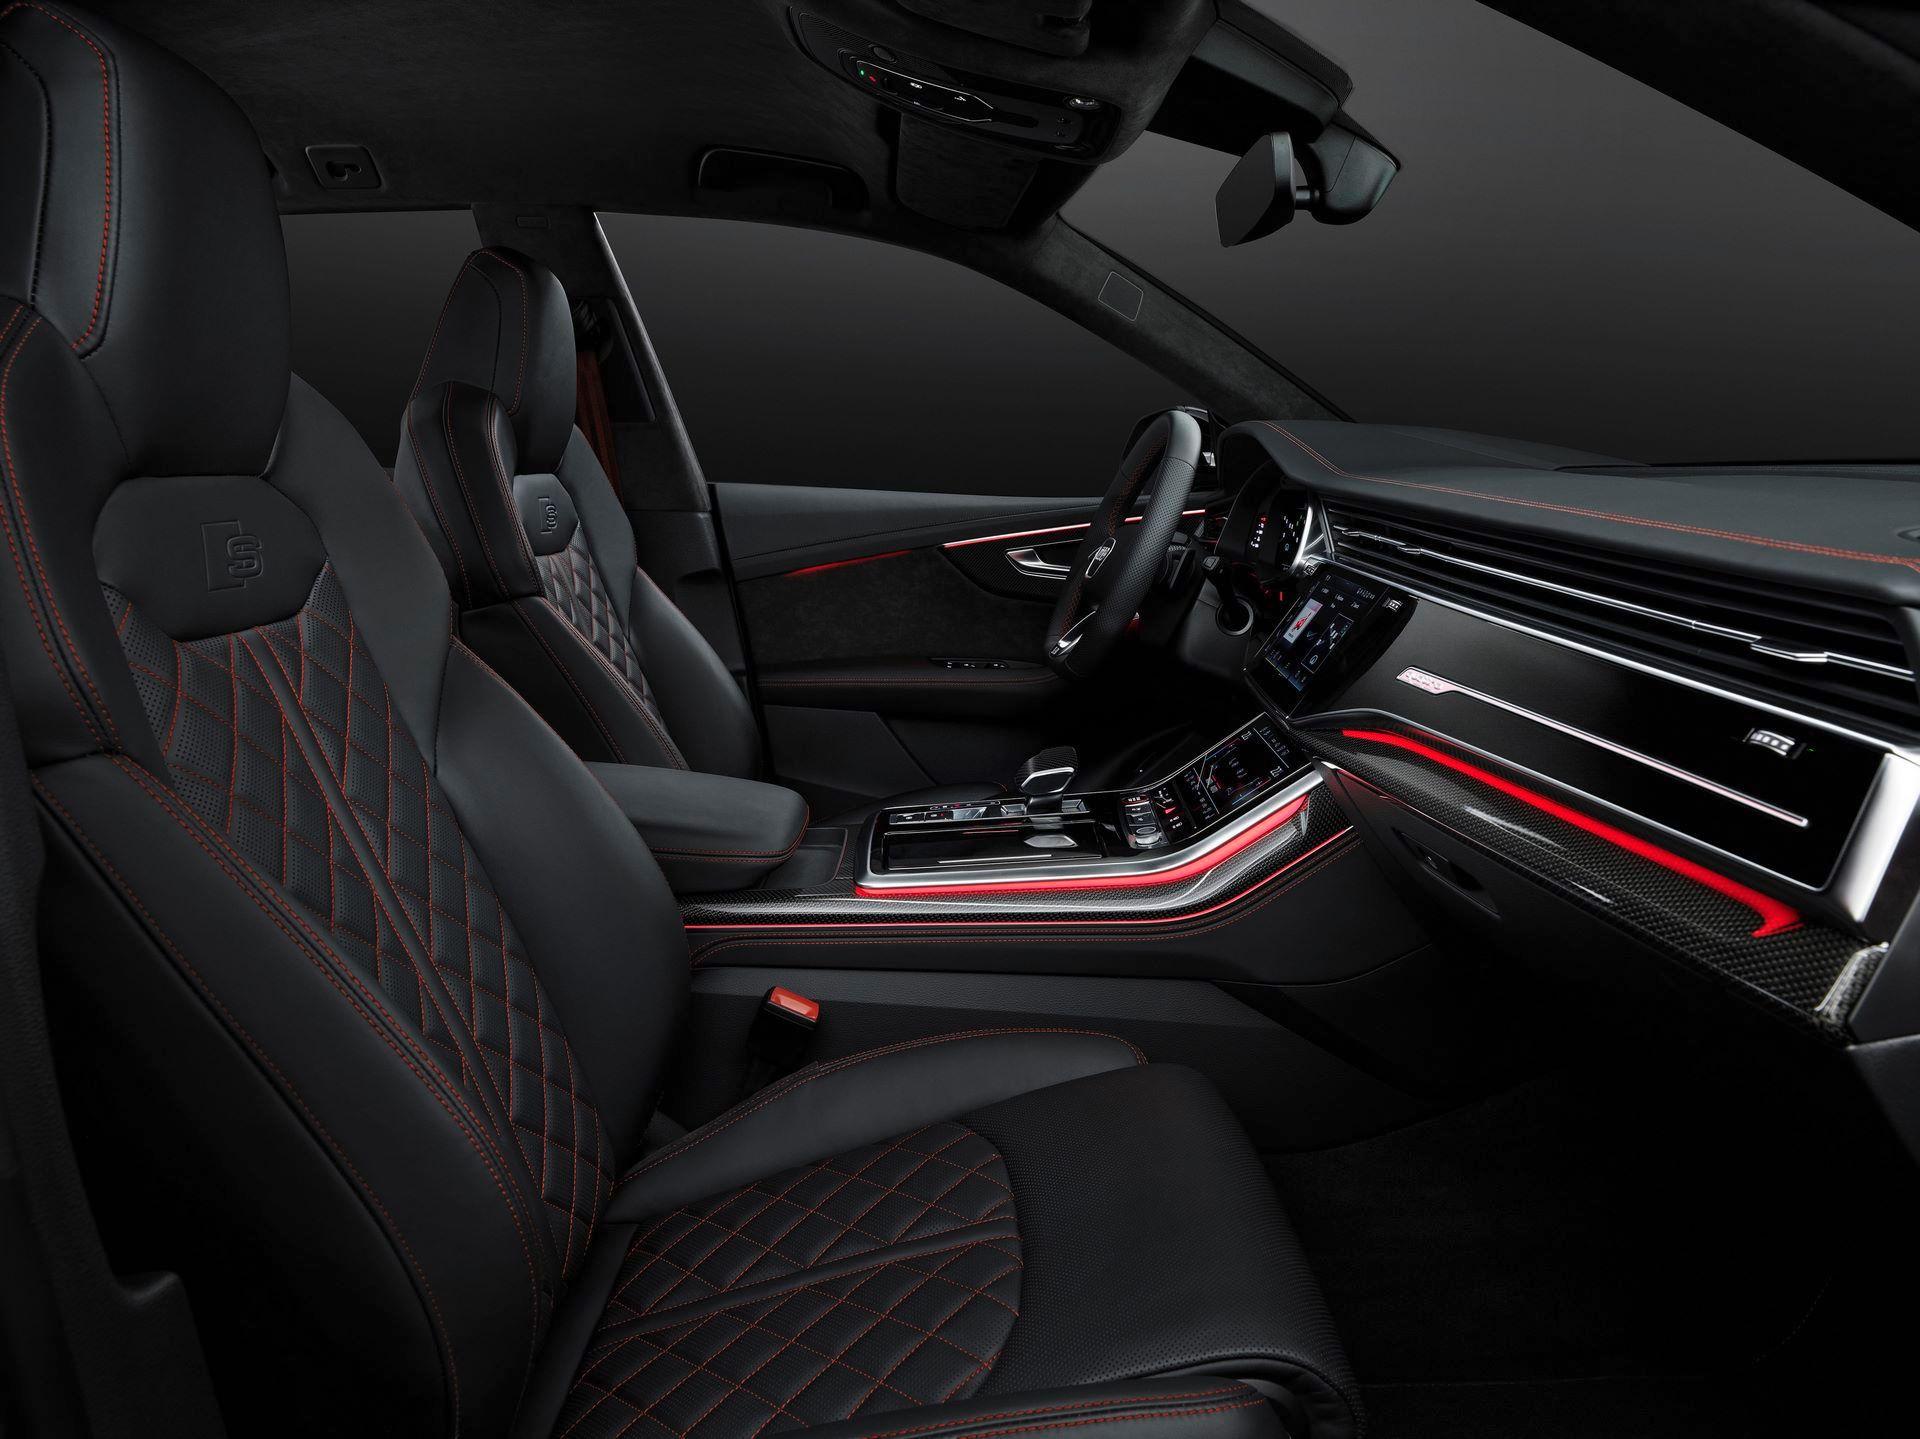 Audi-A4-A5-Q7-Q8-Competition-And-Competition-Plus-Trims-47